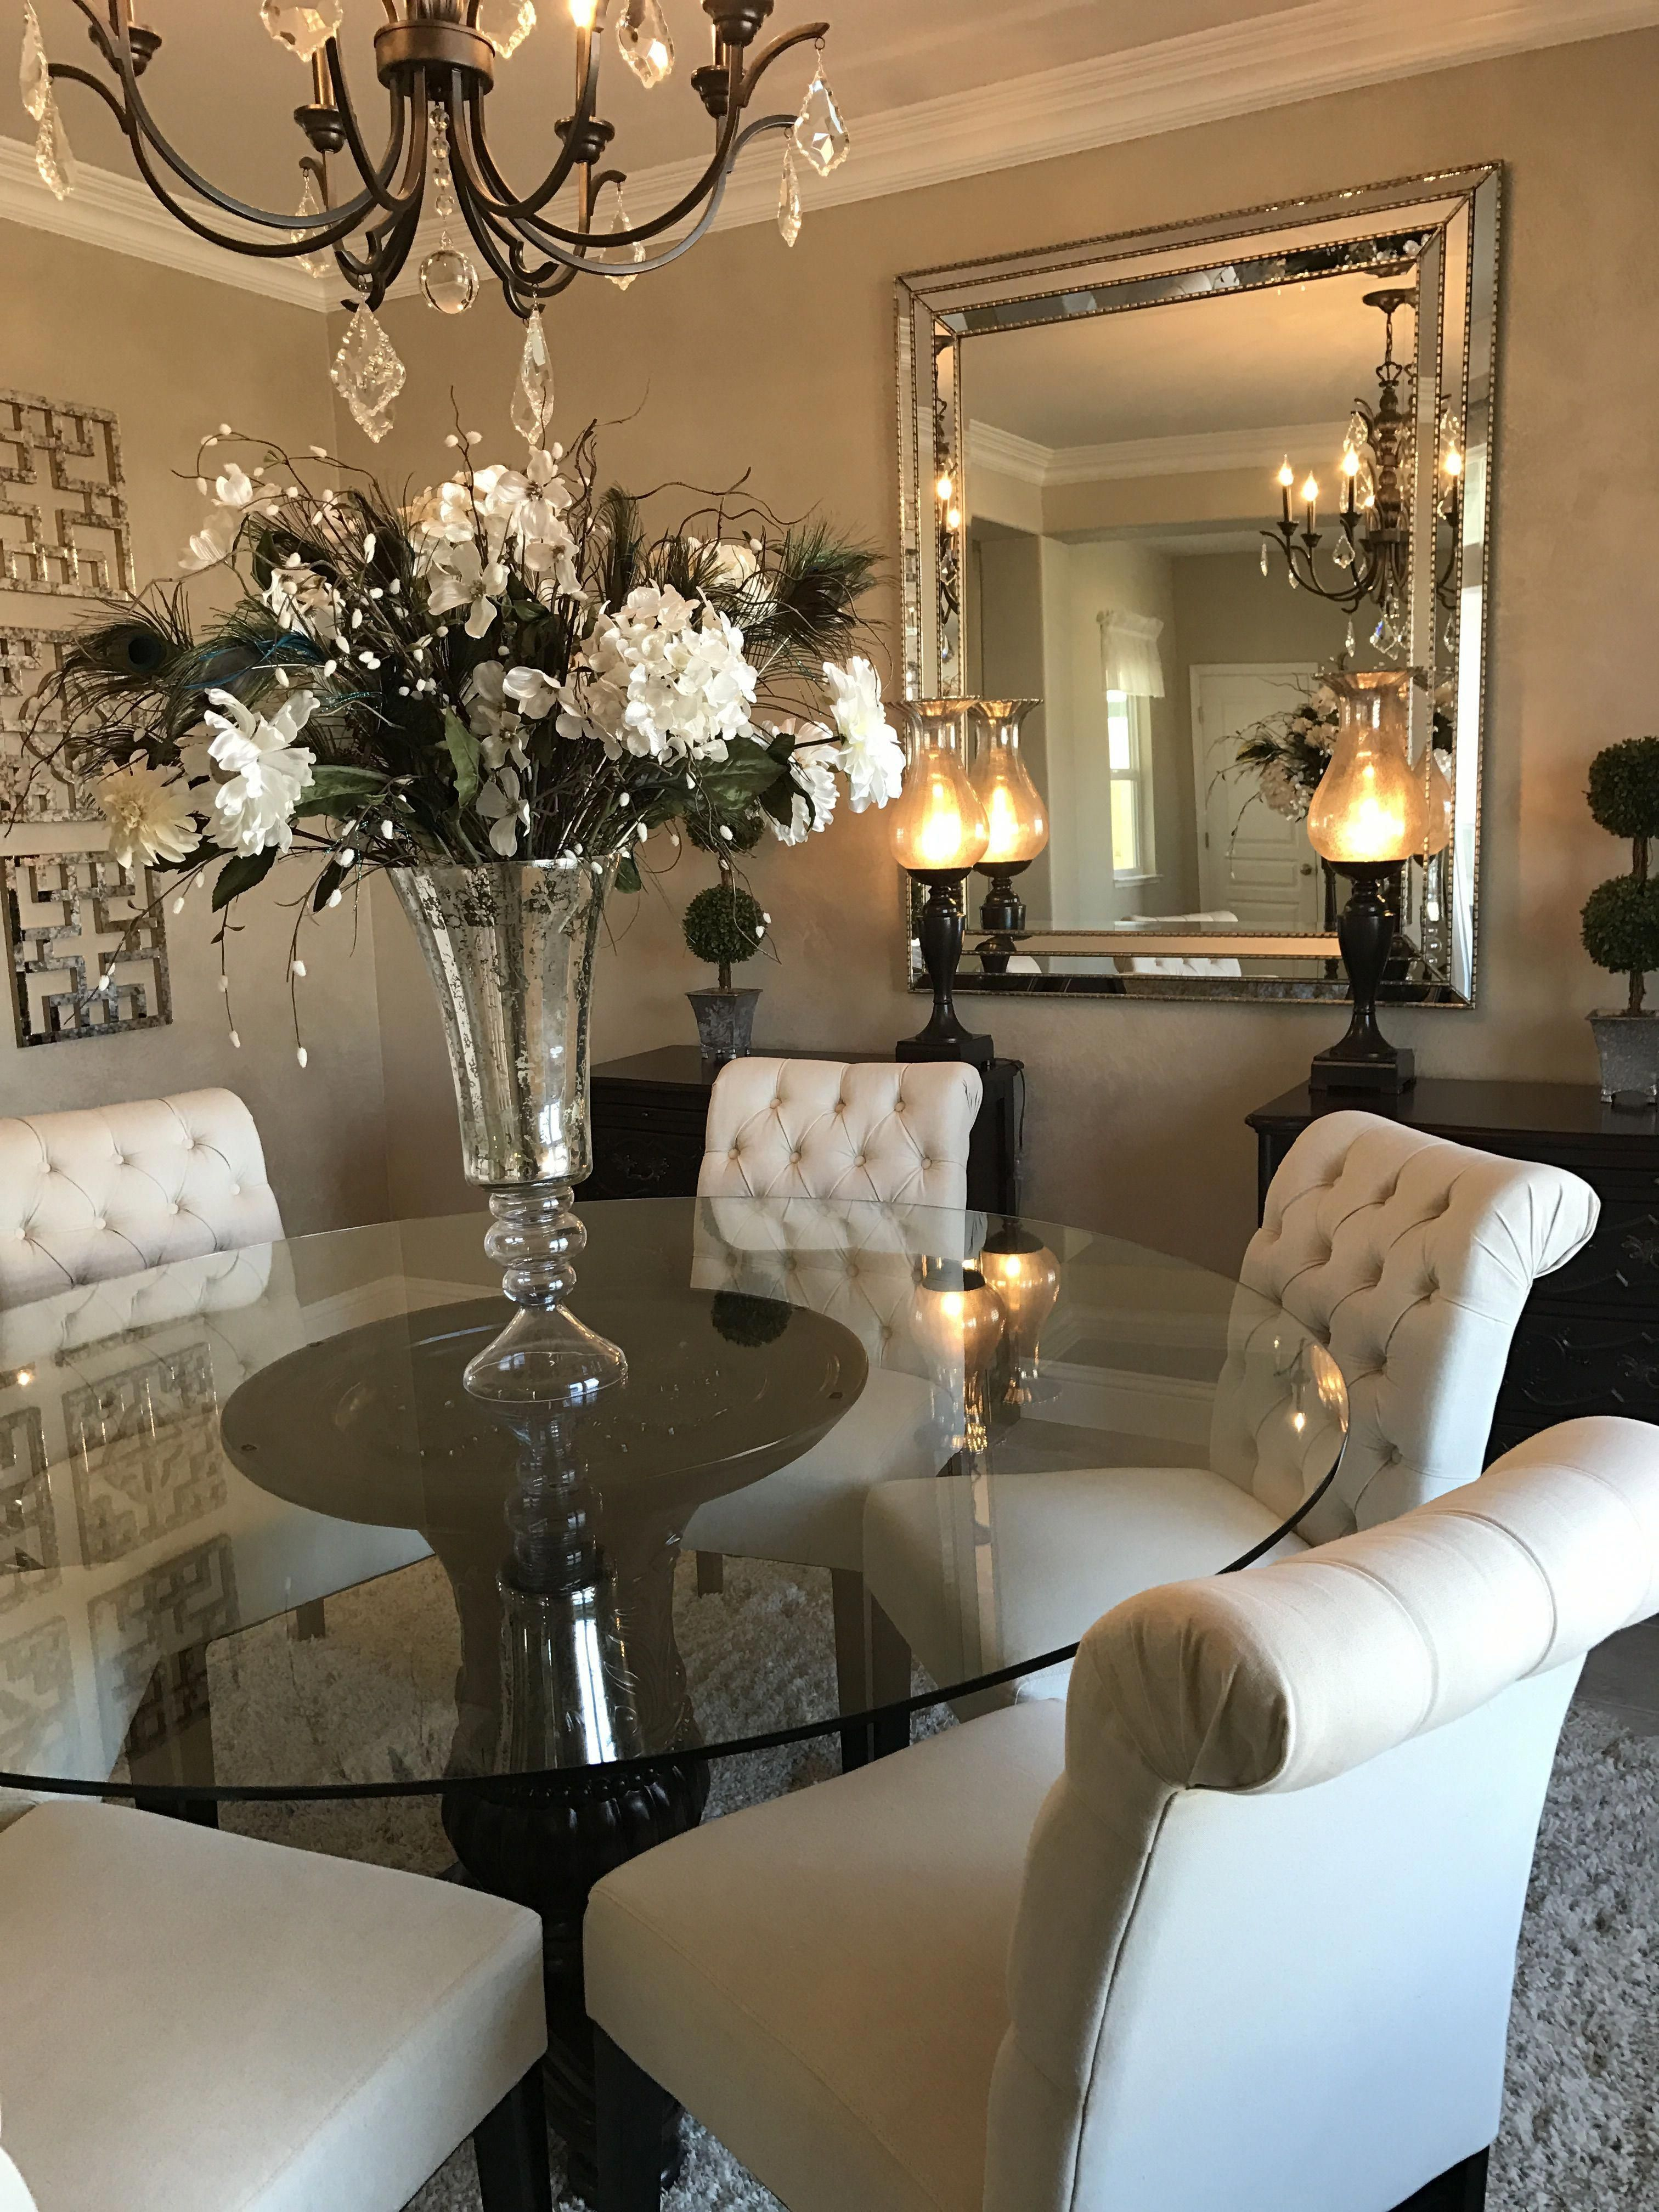 Comedor De Lujo Habitacion Exclusivo De Gama Alta Comedor Eso Es Vivir Luxurydiningroomg With Images Dining Room Wall Decor Dinning Room Decor Home Decor Inspiration